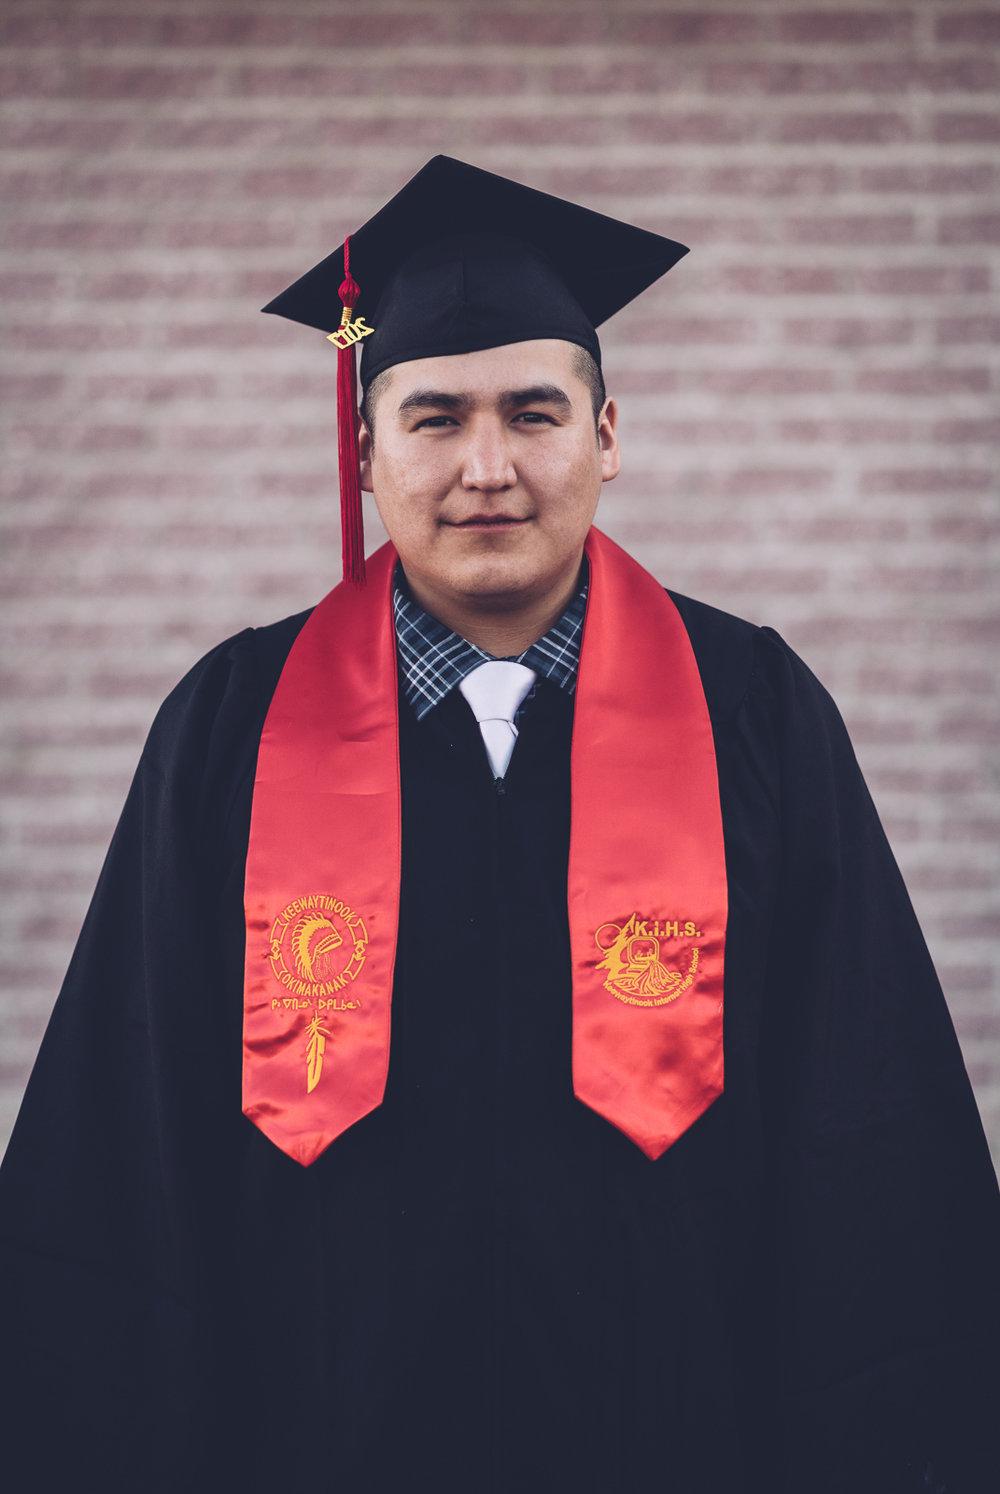 kihs_graduation_blog67.jpg